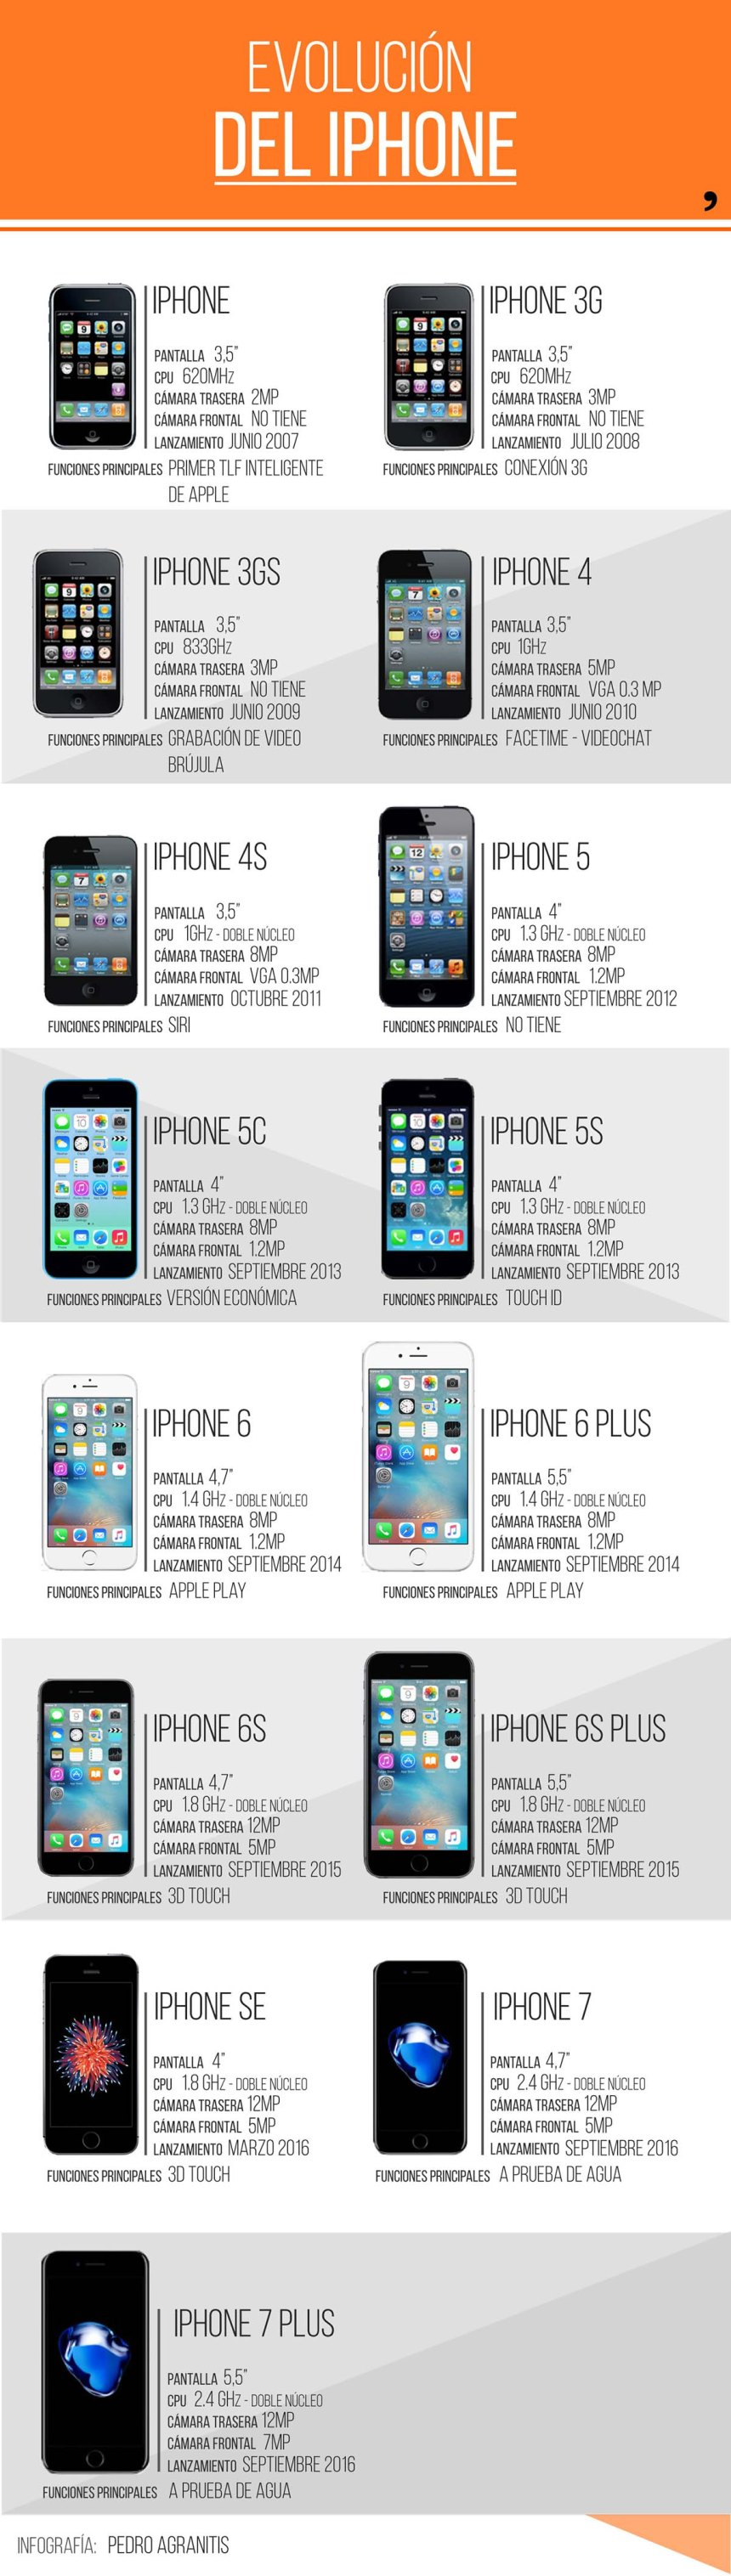 Evolución del iPhone (del iPhone al iPhone 7)